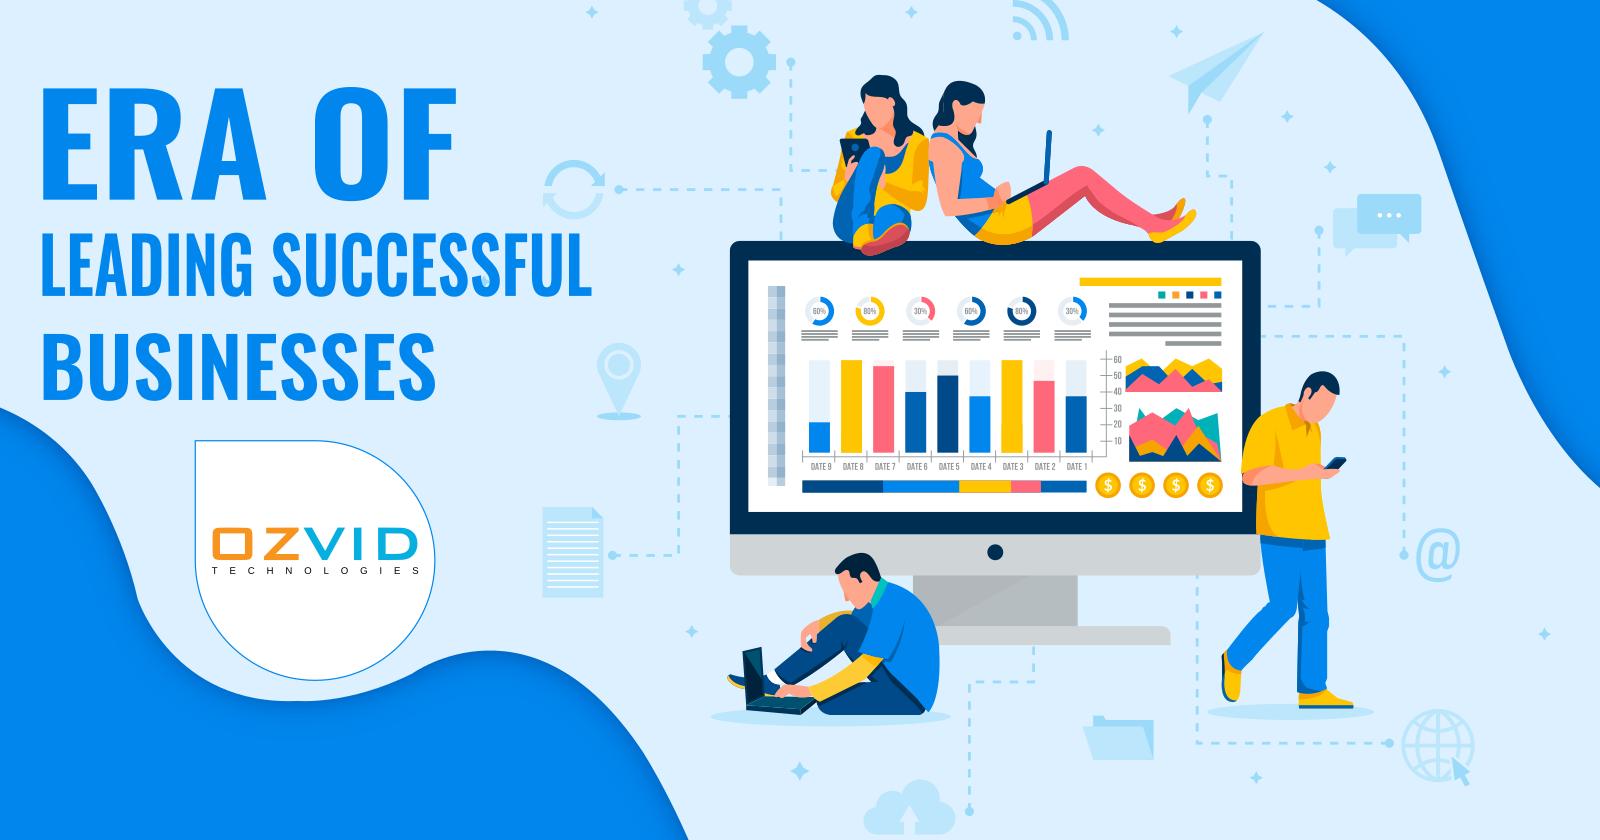 Digital Marketing: Era of Leading Successful Businesses